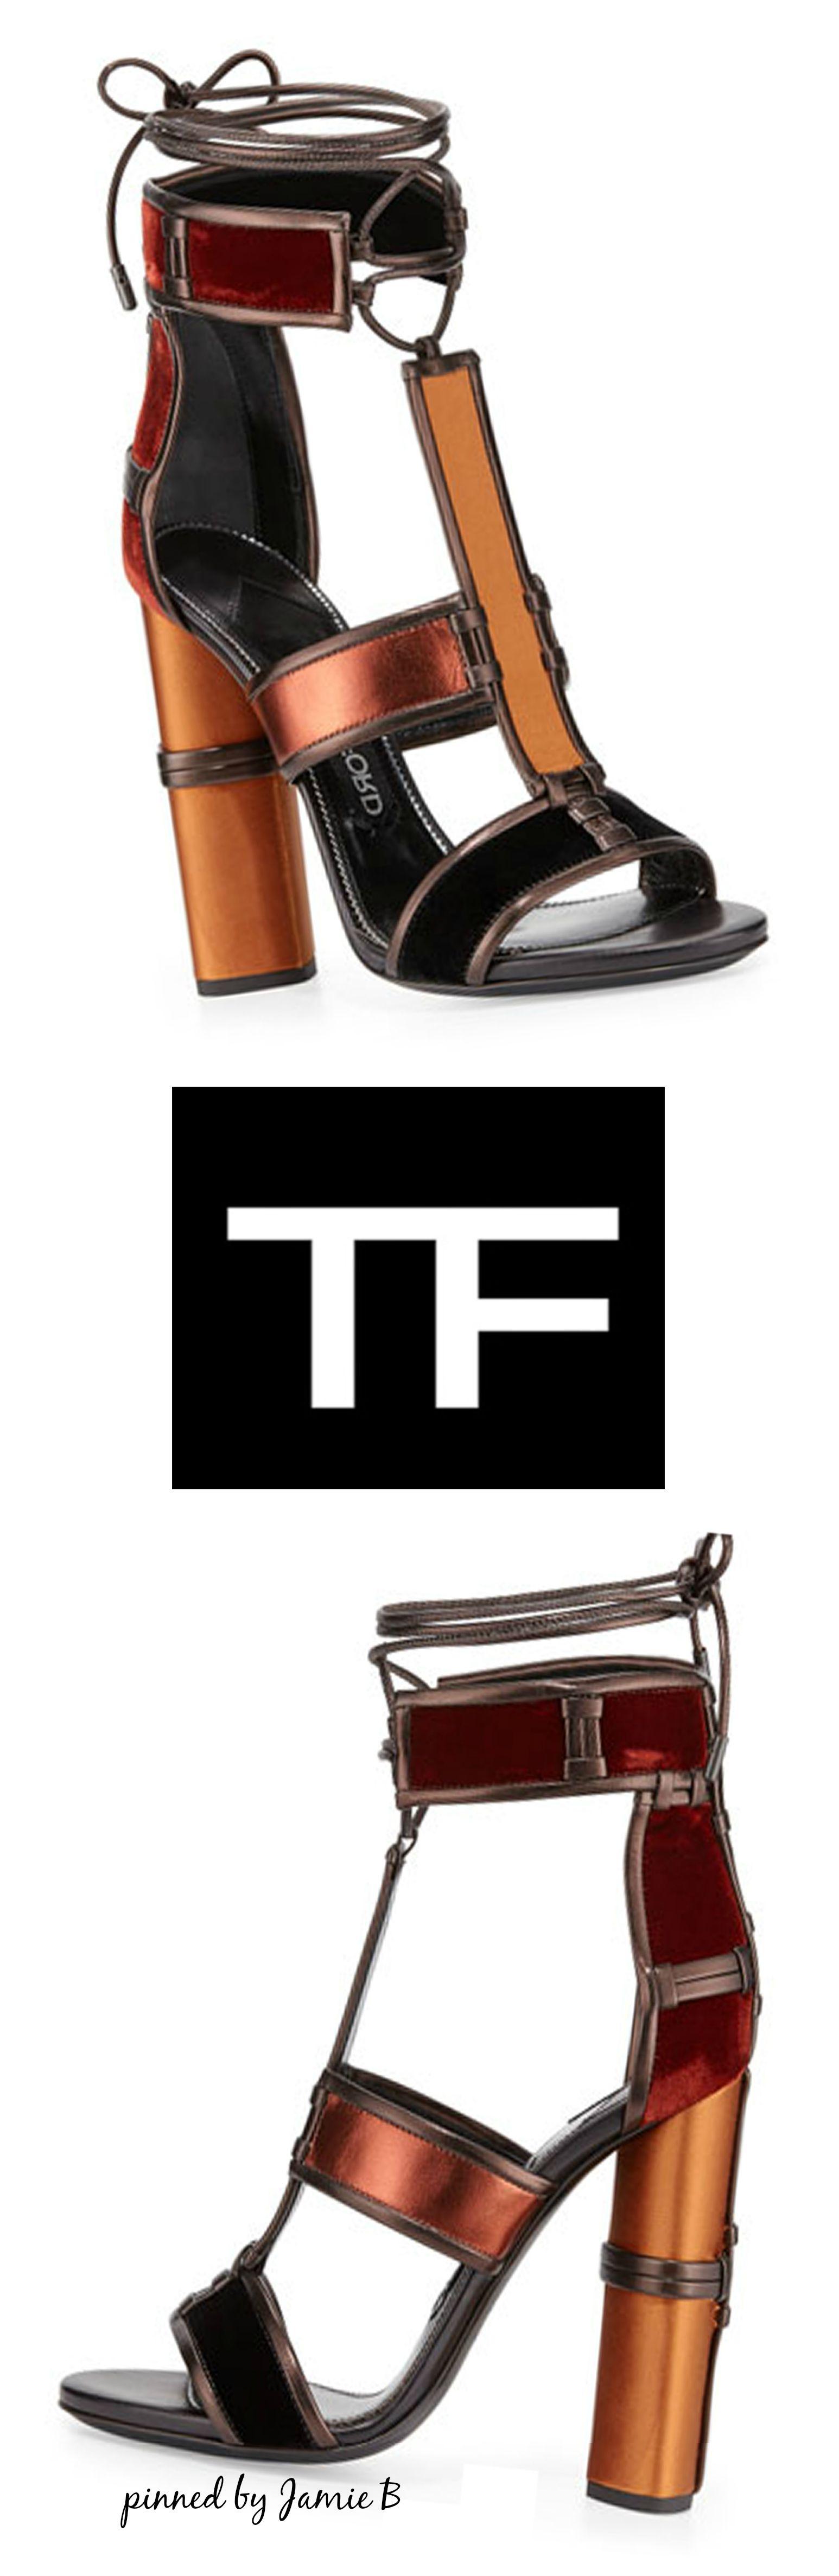 pvc ford women tom slingback sandals heels strass shoes shoebaloo nl